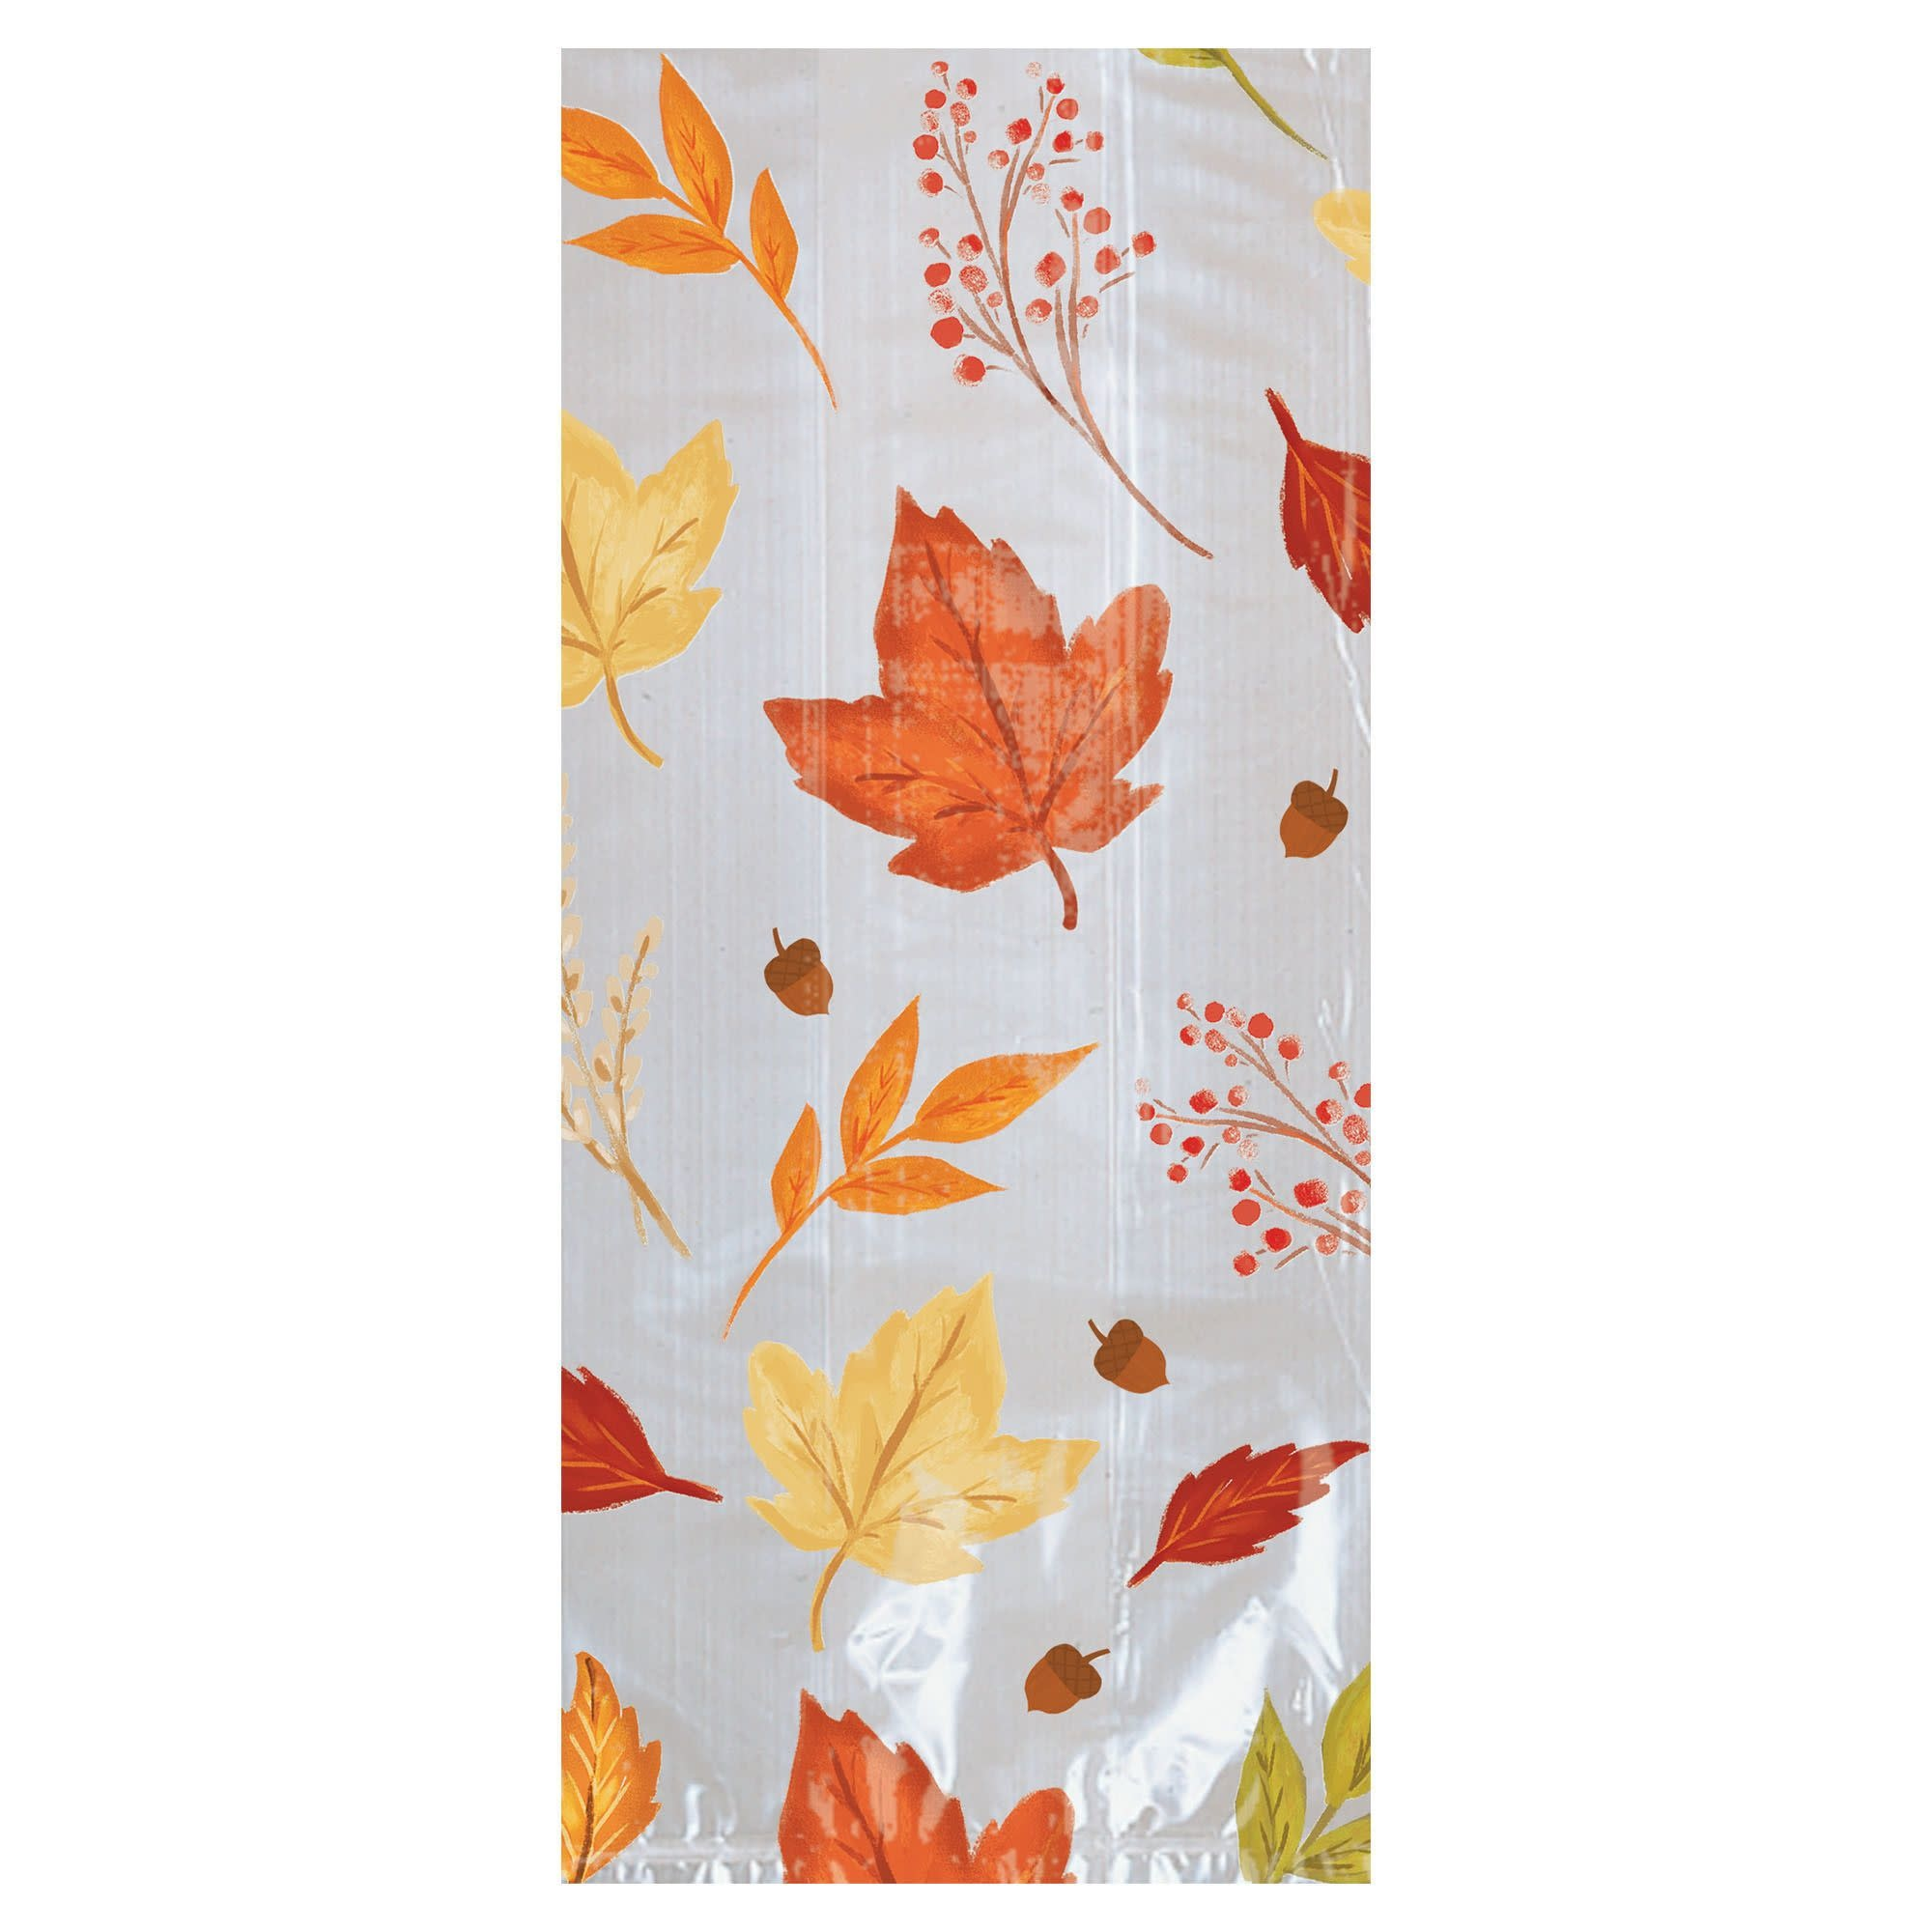 Fall Foliage Small Cello Bags